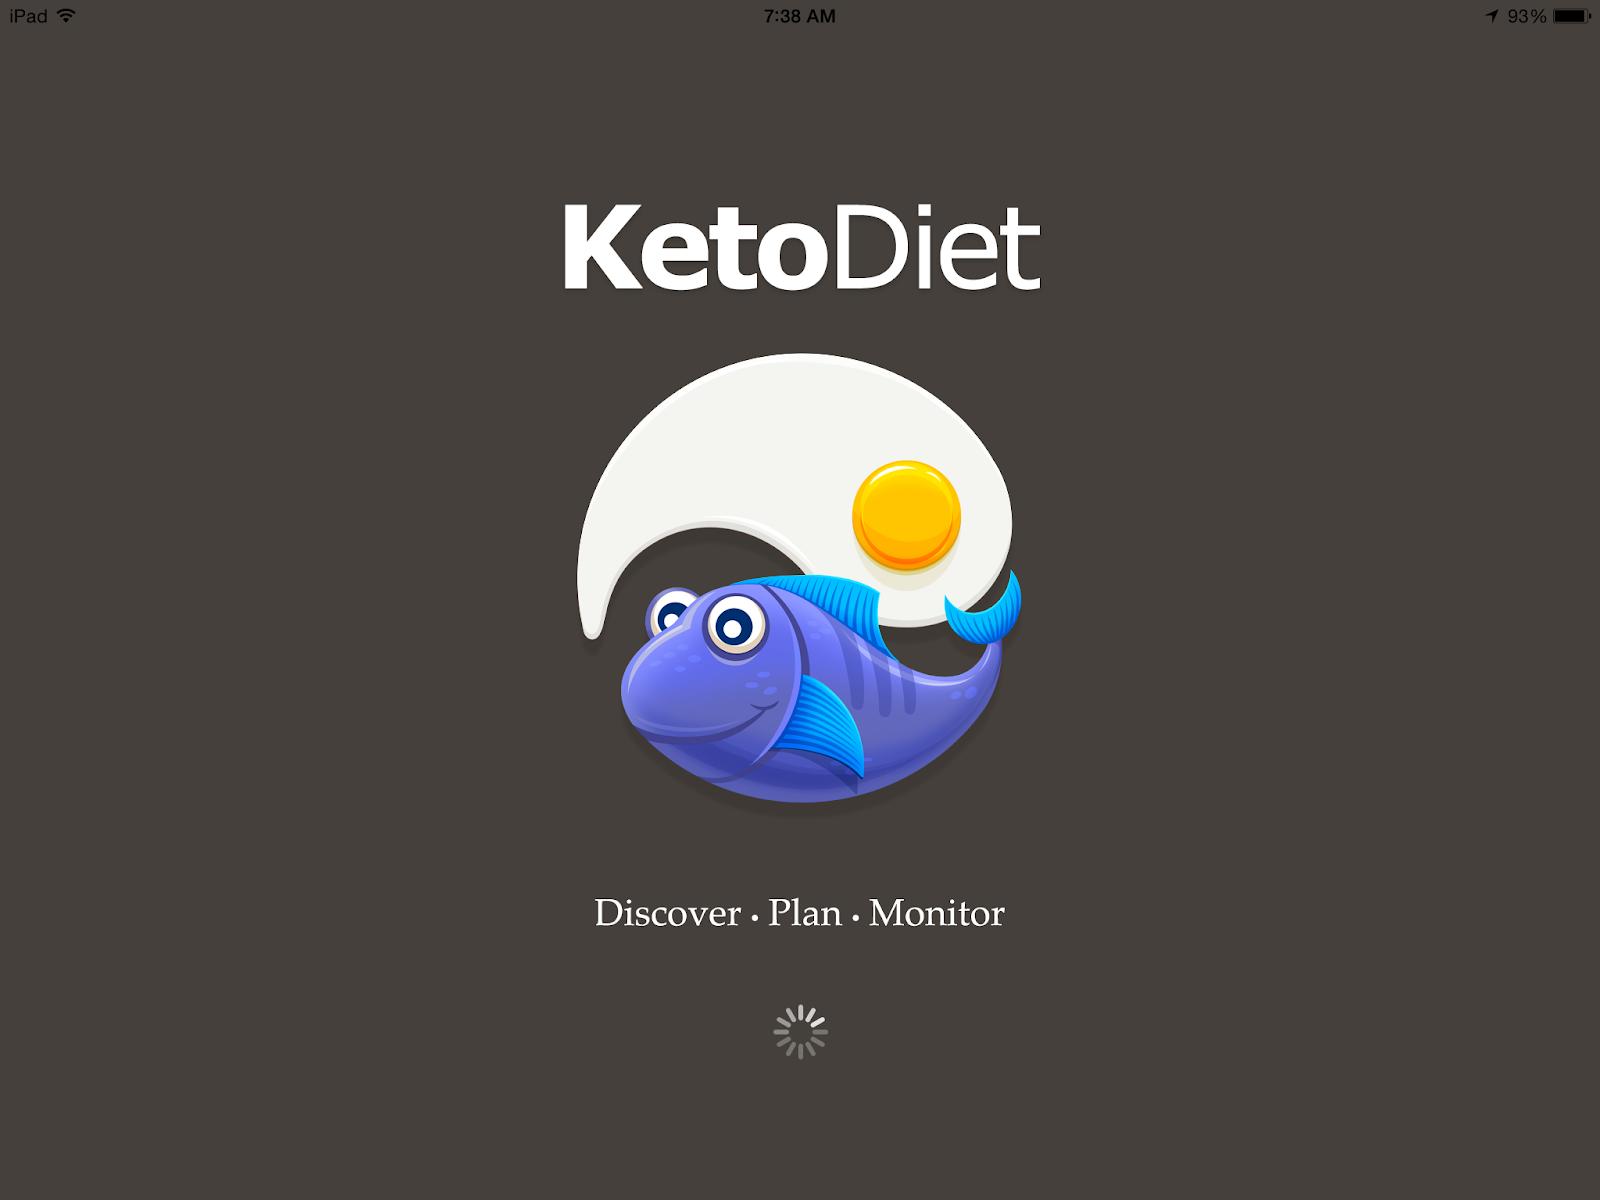 keto app logo.PNG